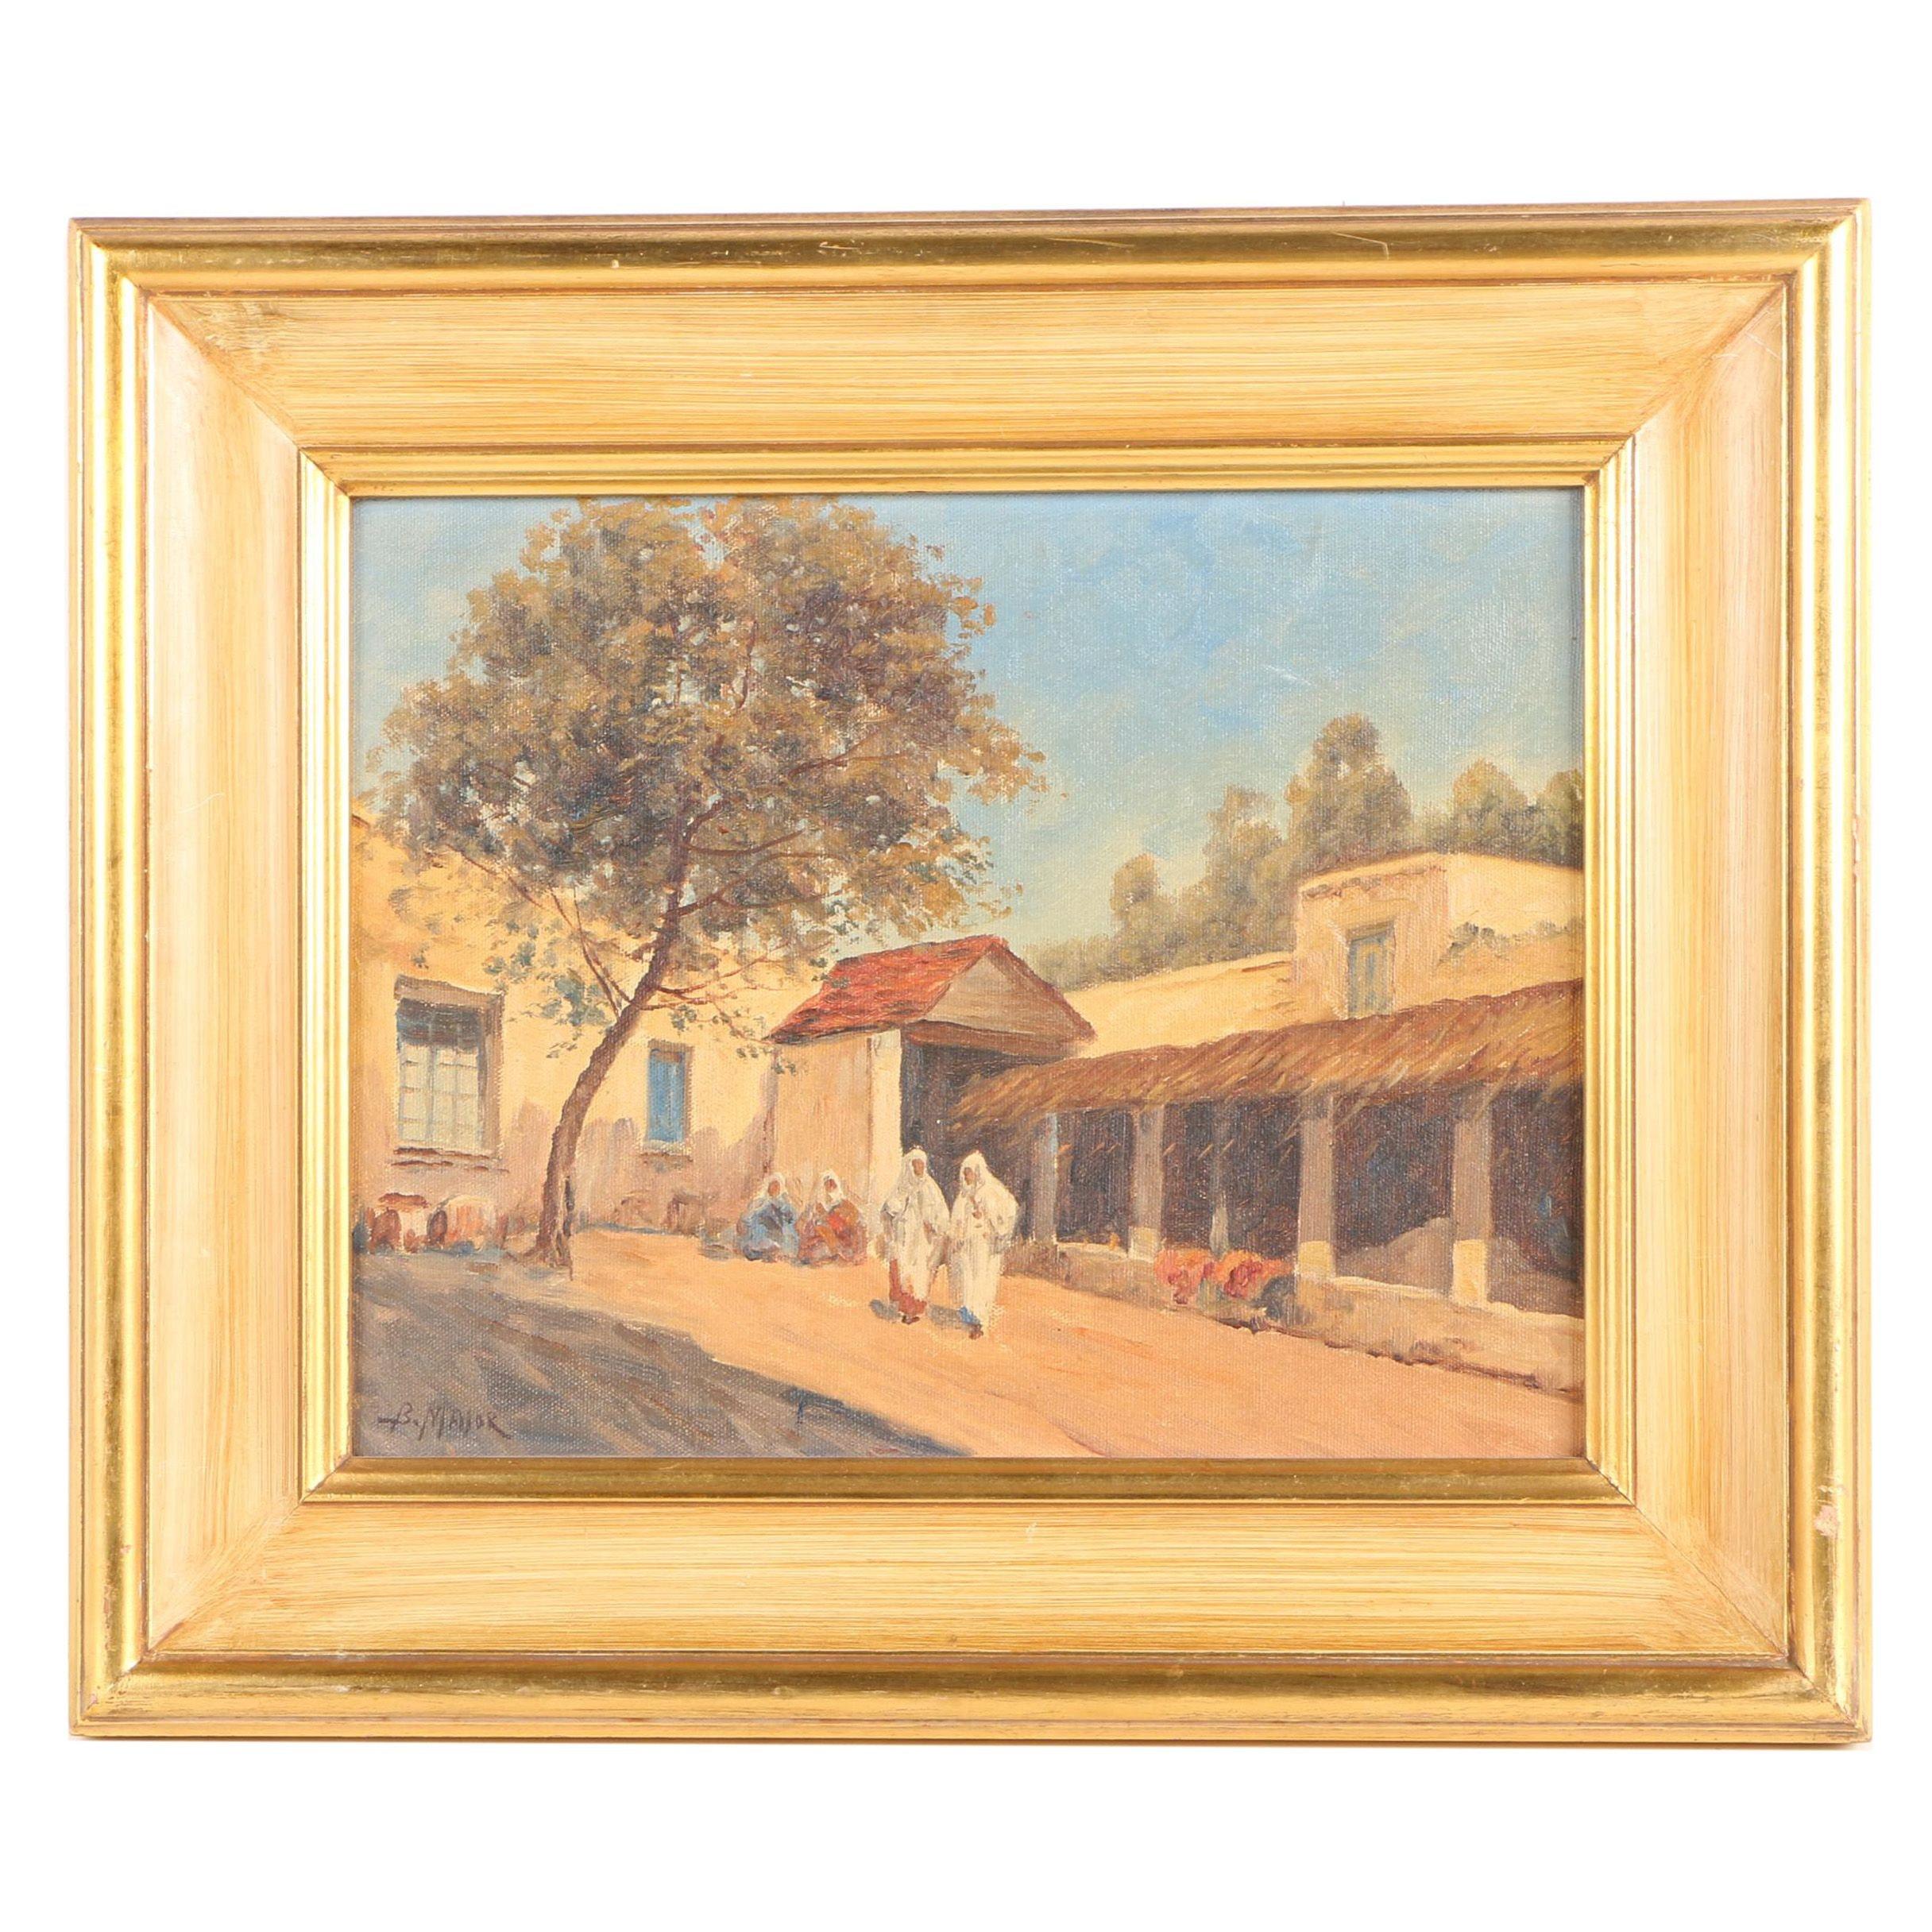 Boris B. Major Oil Painting on Canvas